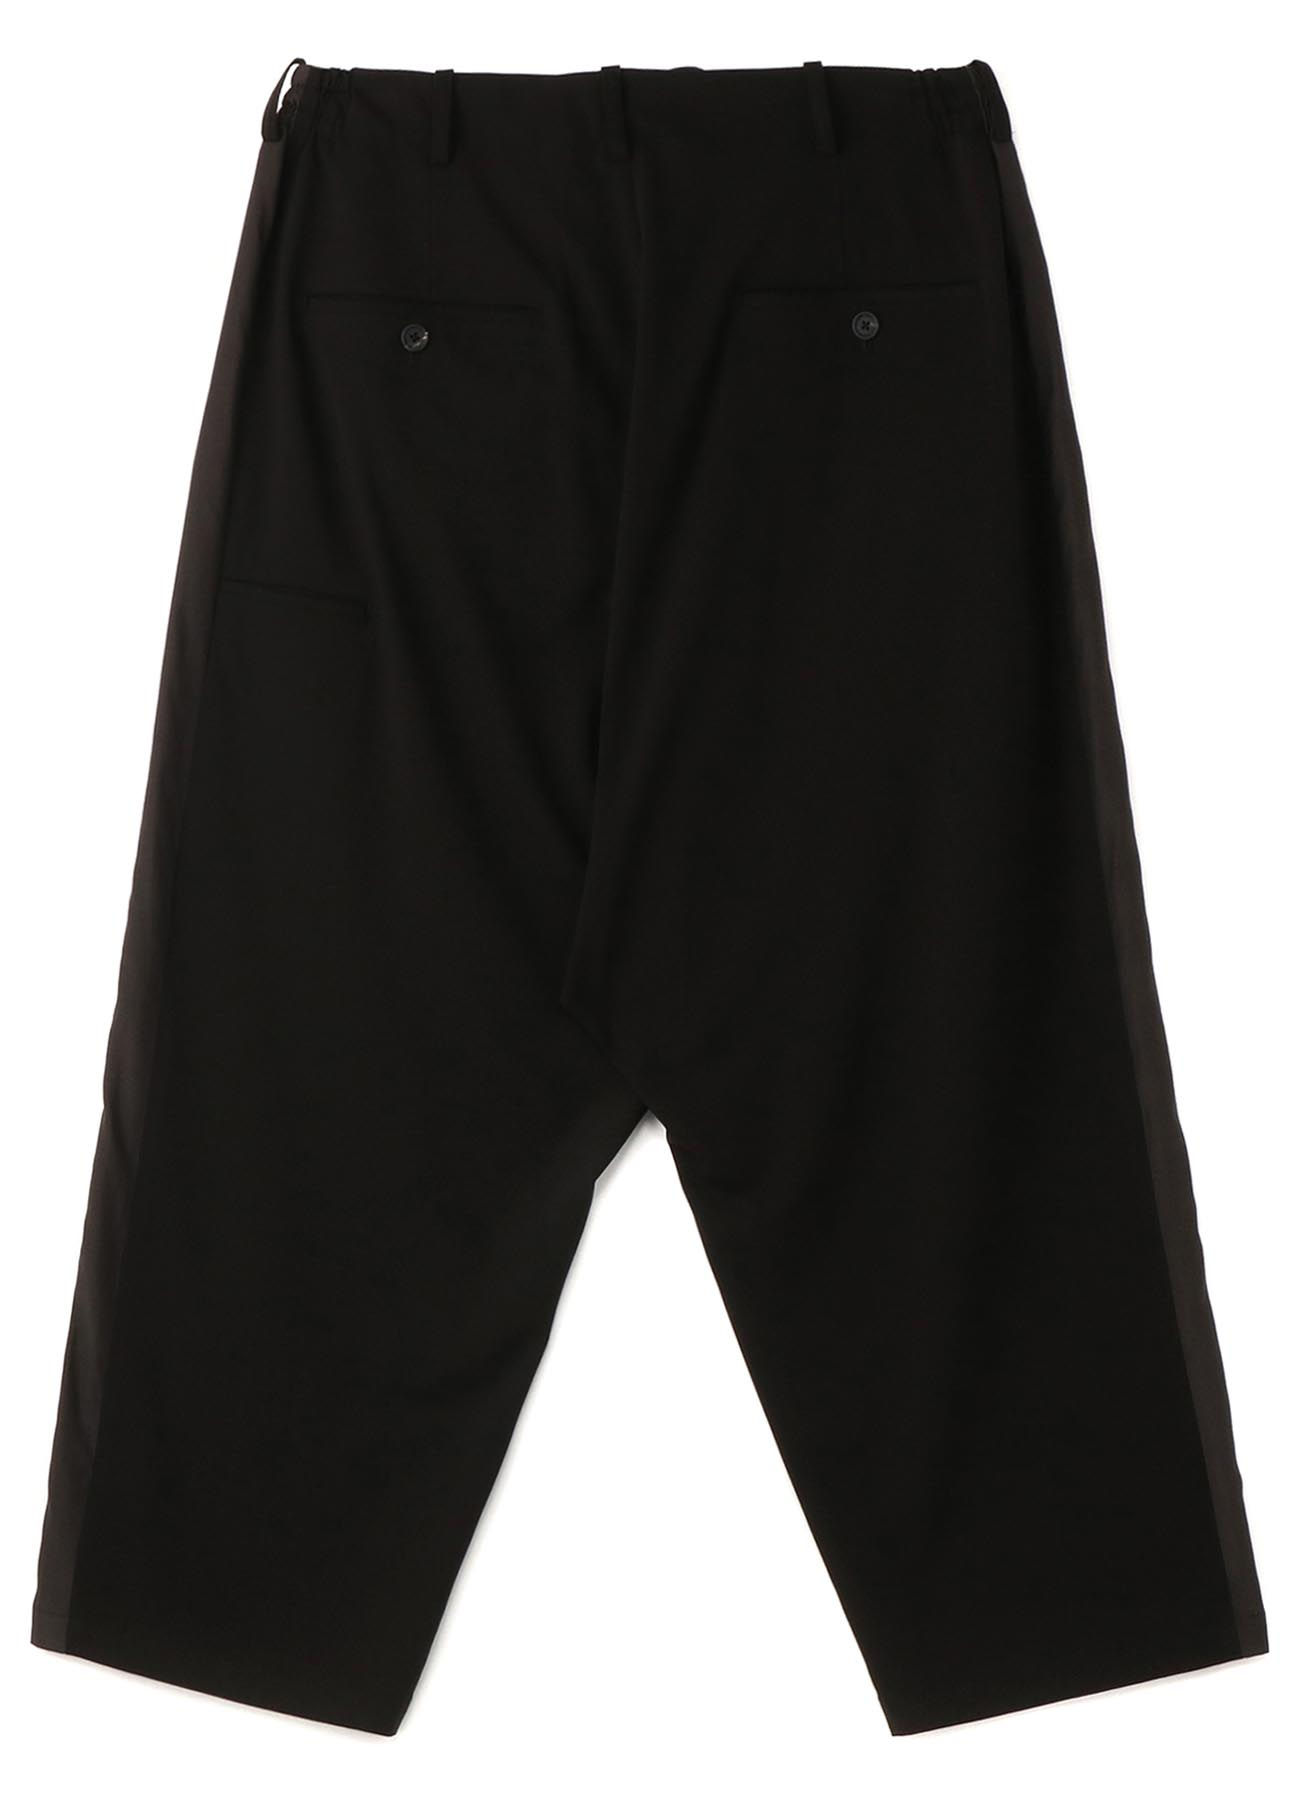 Pe/Rayon Gabardine Stretch One-tuck Side Tape Extra Wide Sarouel Pants